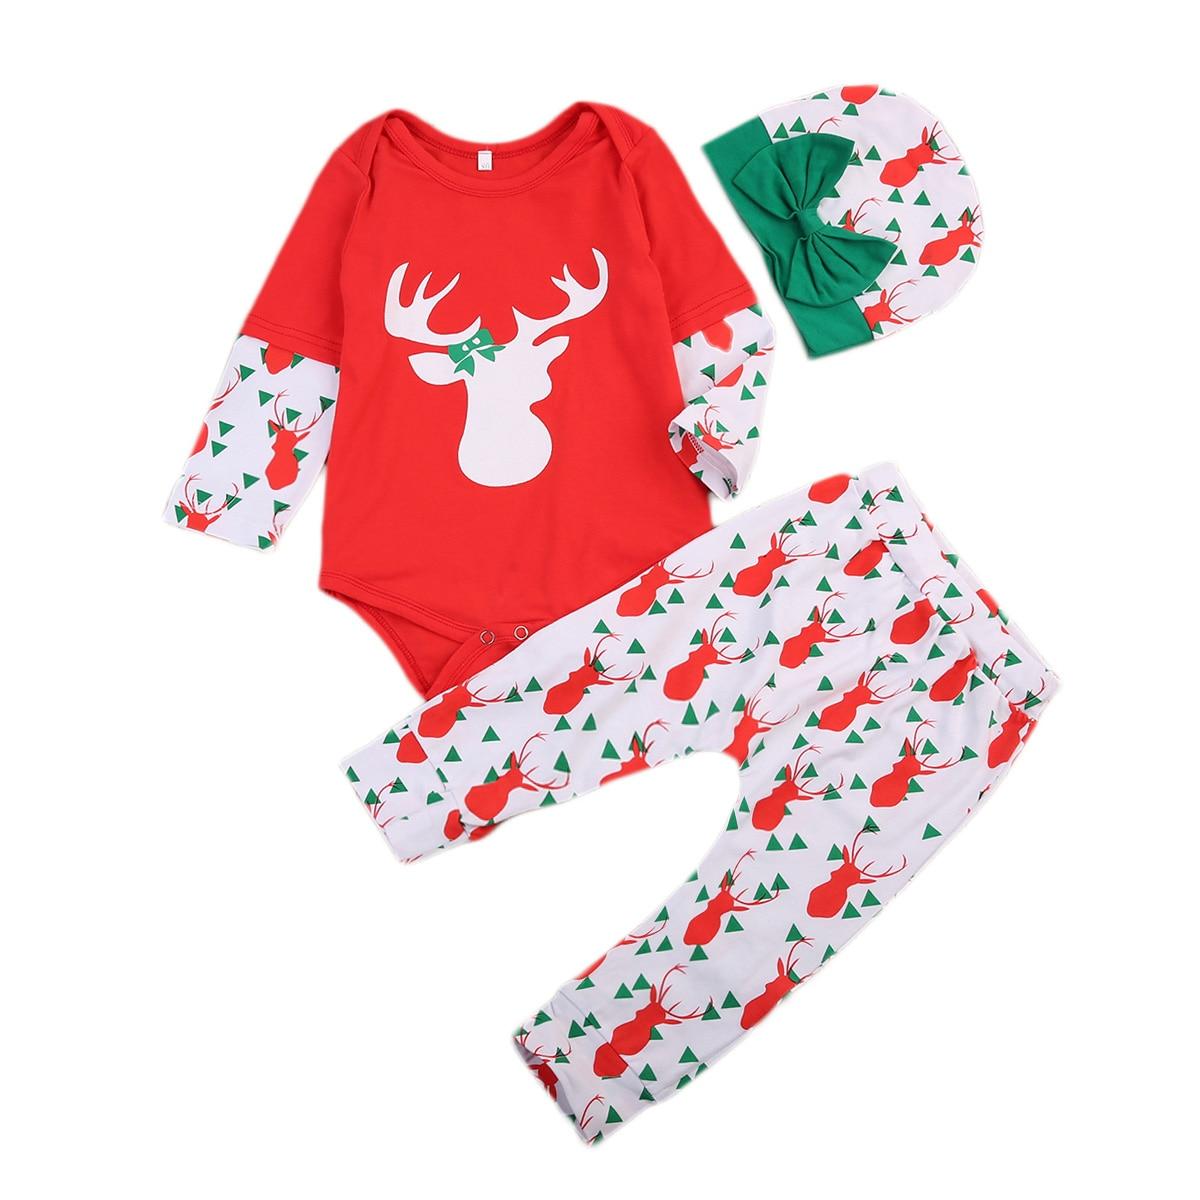 Clothing Christmas Pants Outfits-Set Tops Romper Long-Sleeve Deer Newborn Babies Baby-Boy-Girl